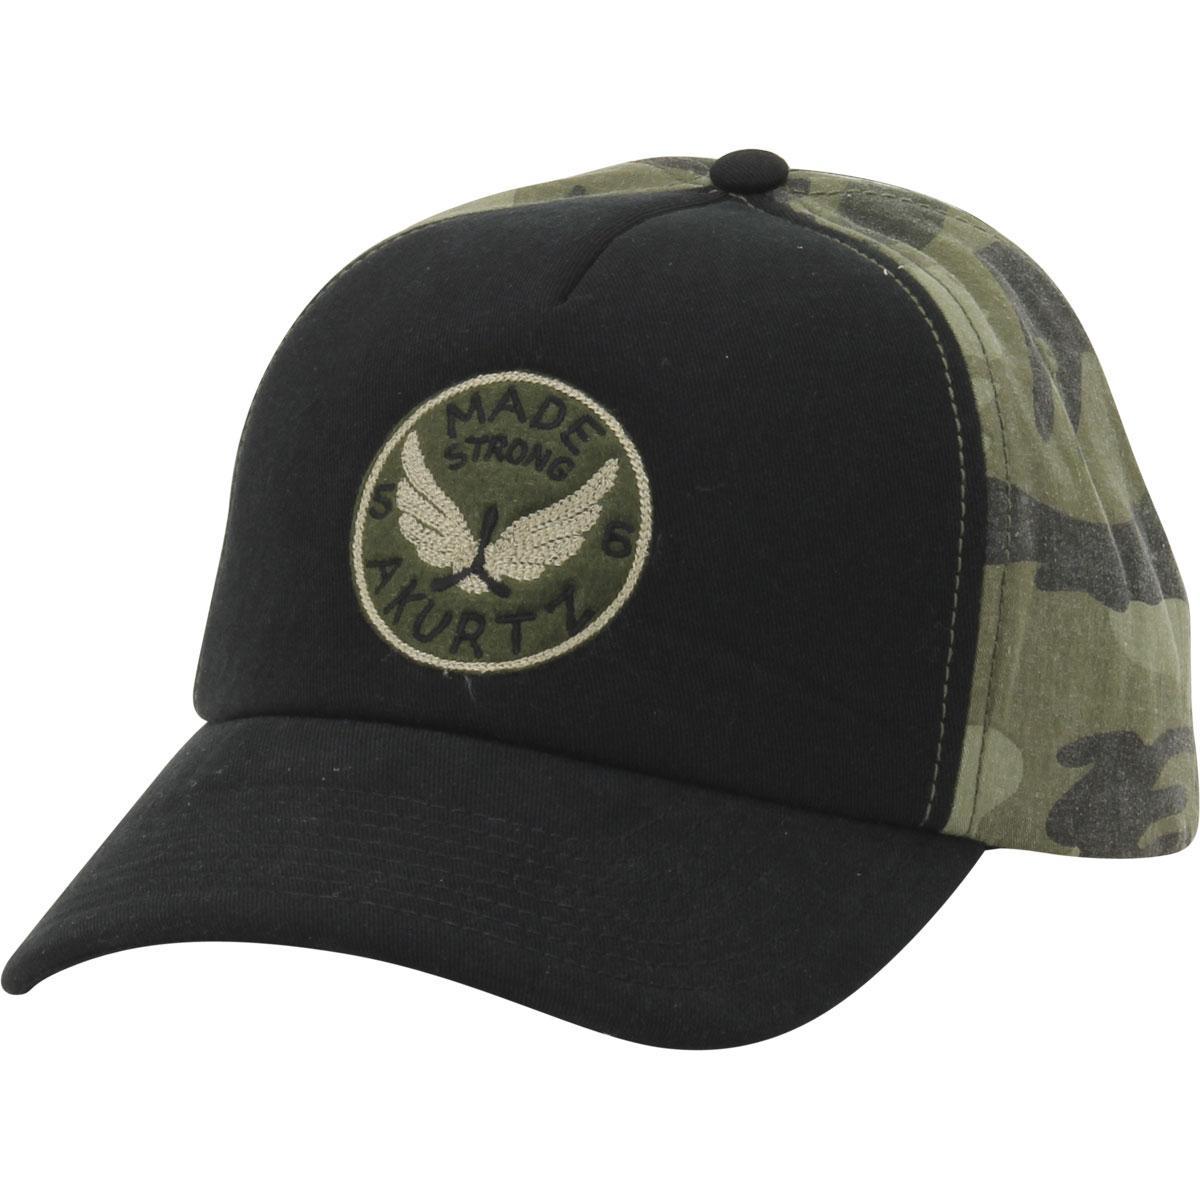 Image of Kurtz Men's Camo Made Strong Baseball Cap Hat - Black/Camo - One Size Fits Most